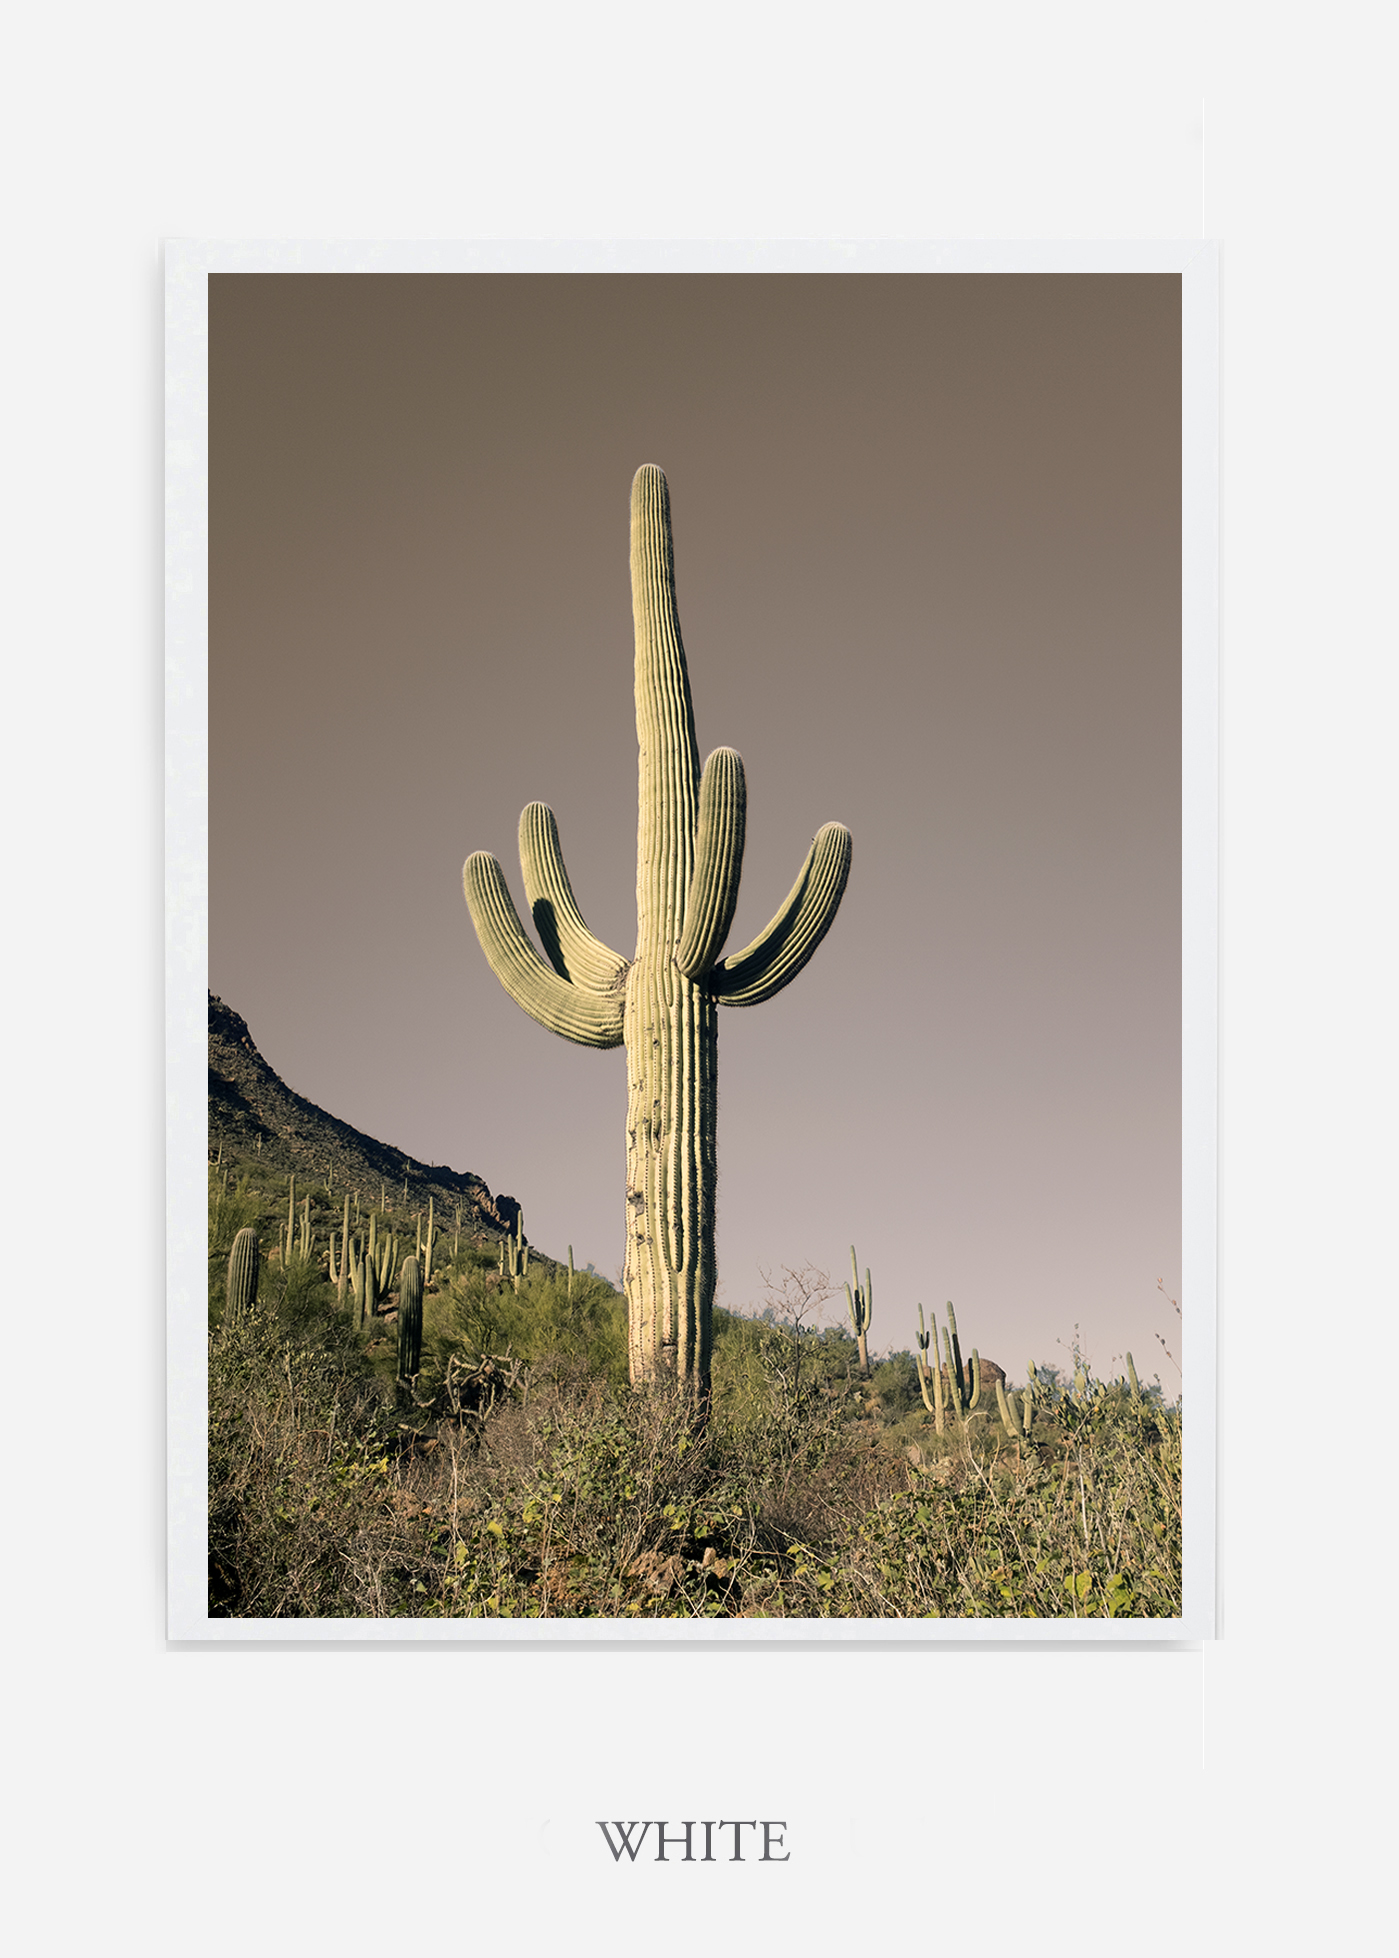 nomat-whiteframe-saguaroNo.20-wildercalifornia-art-wallart-cactusprint-homedecor-prints-arizona-botanical-artwork-interiordesign.jpg